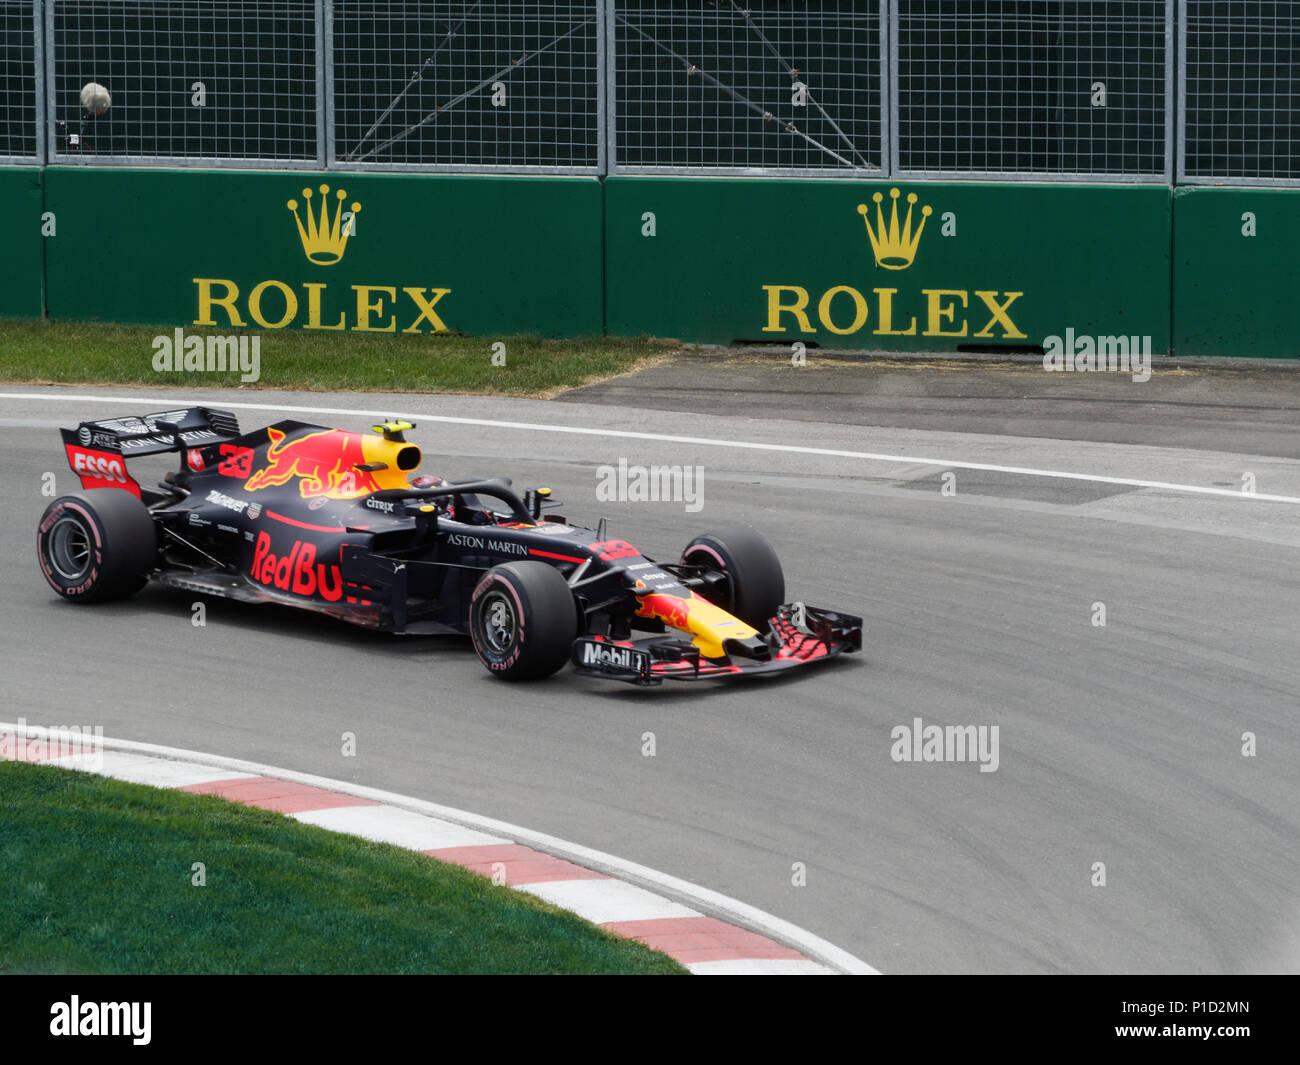 Formula 1 Canadian Grand Prix - Stock Image